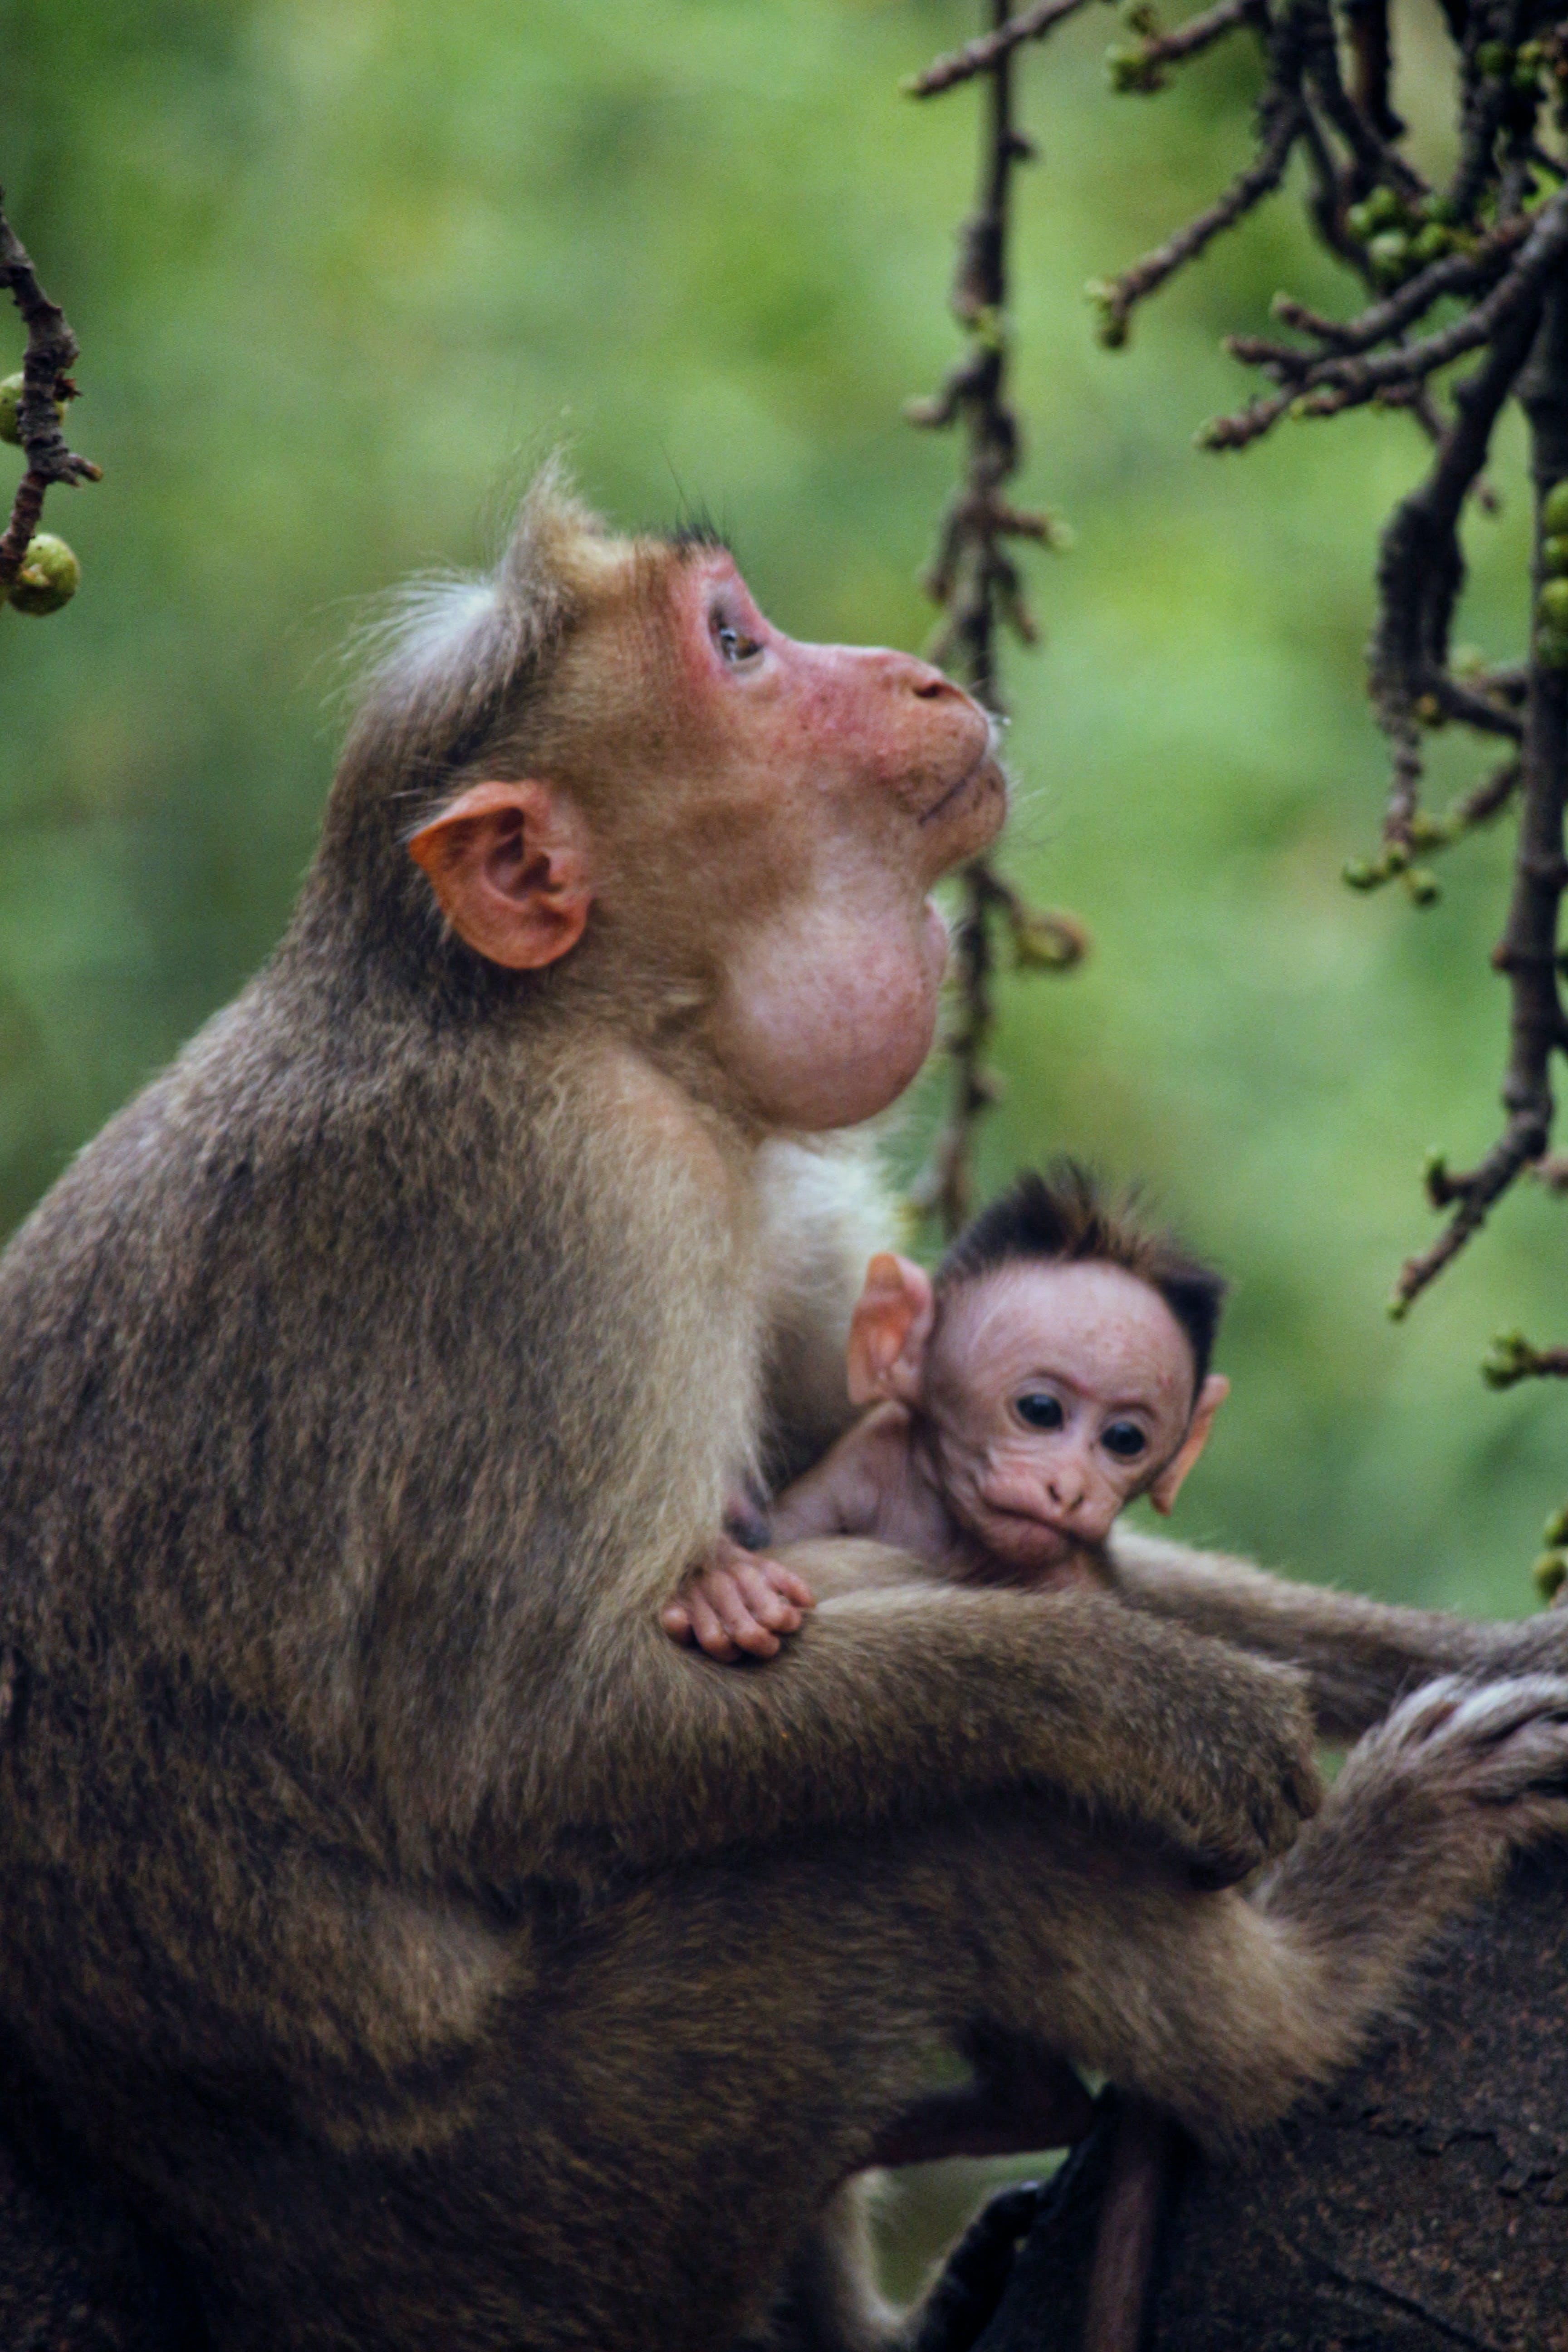 Free stock photo of animal, baby, care, child